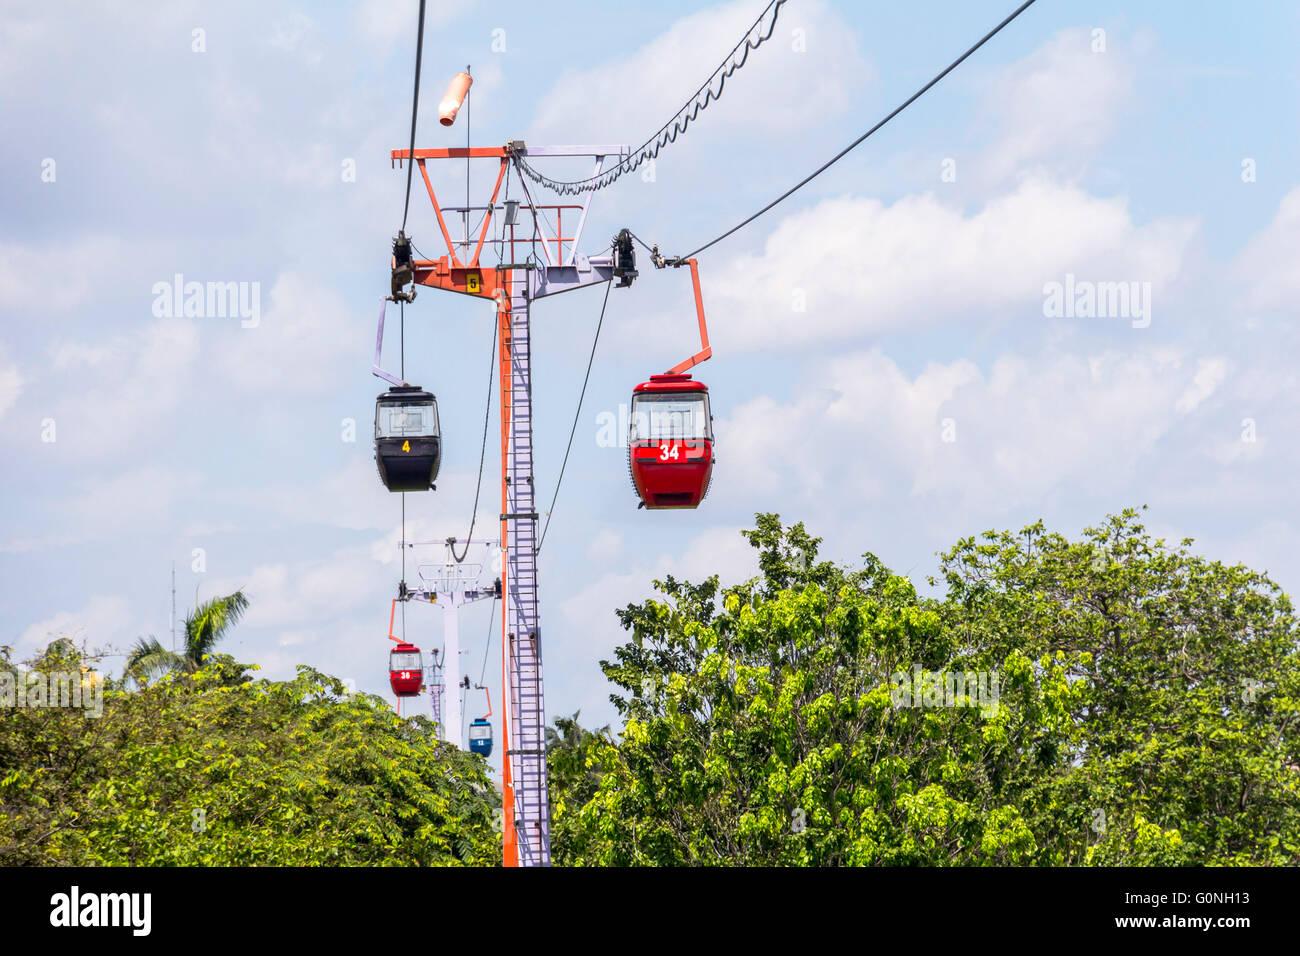 Cable railway in Taman Mini Park, Jakarta - Stock Image